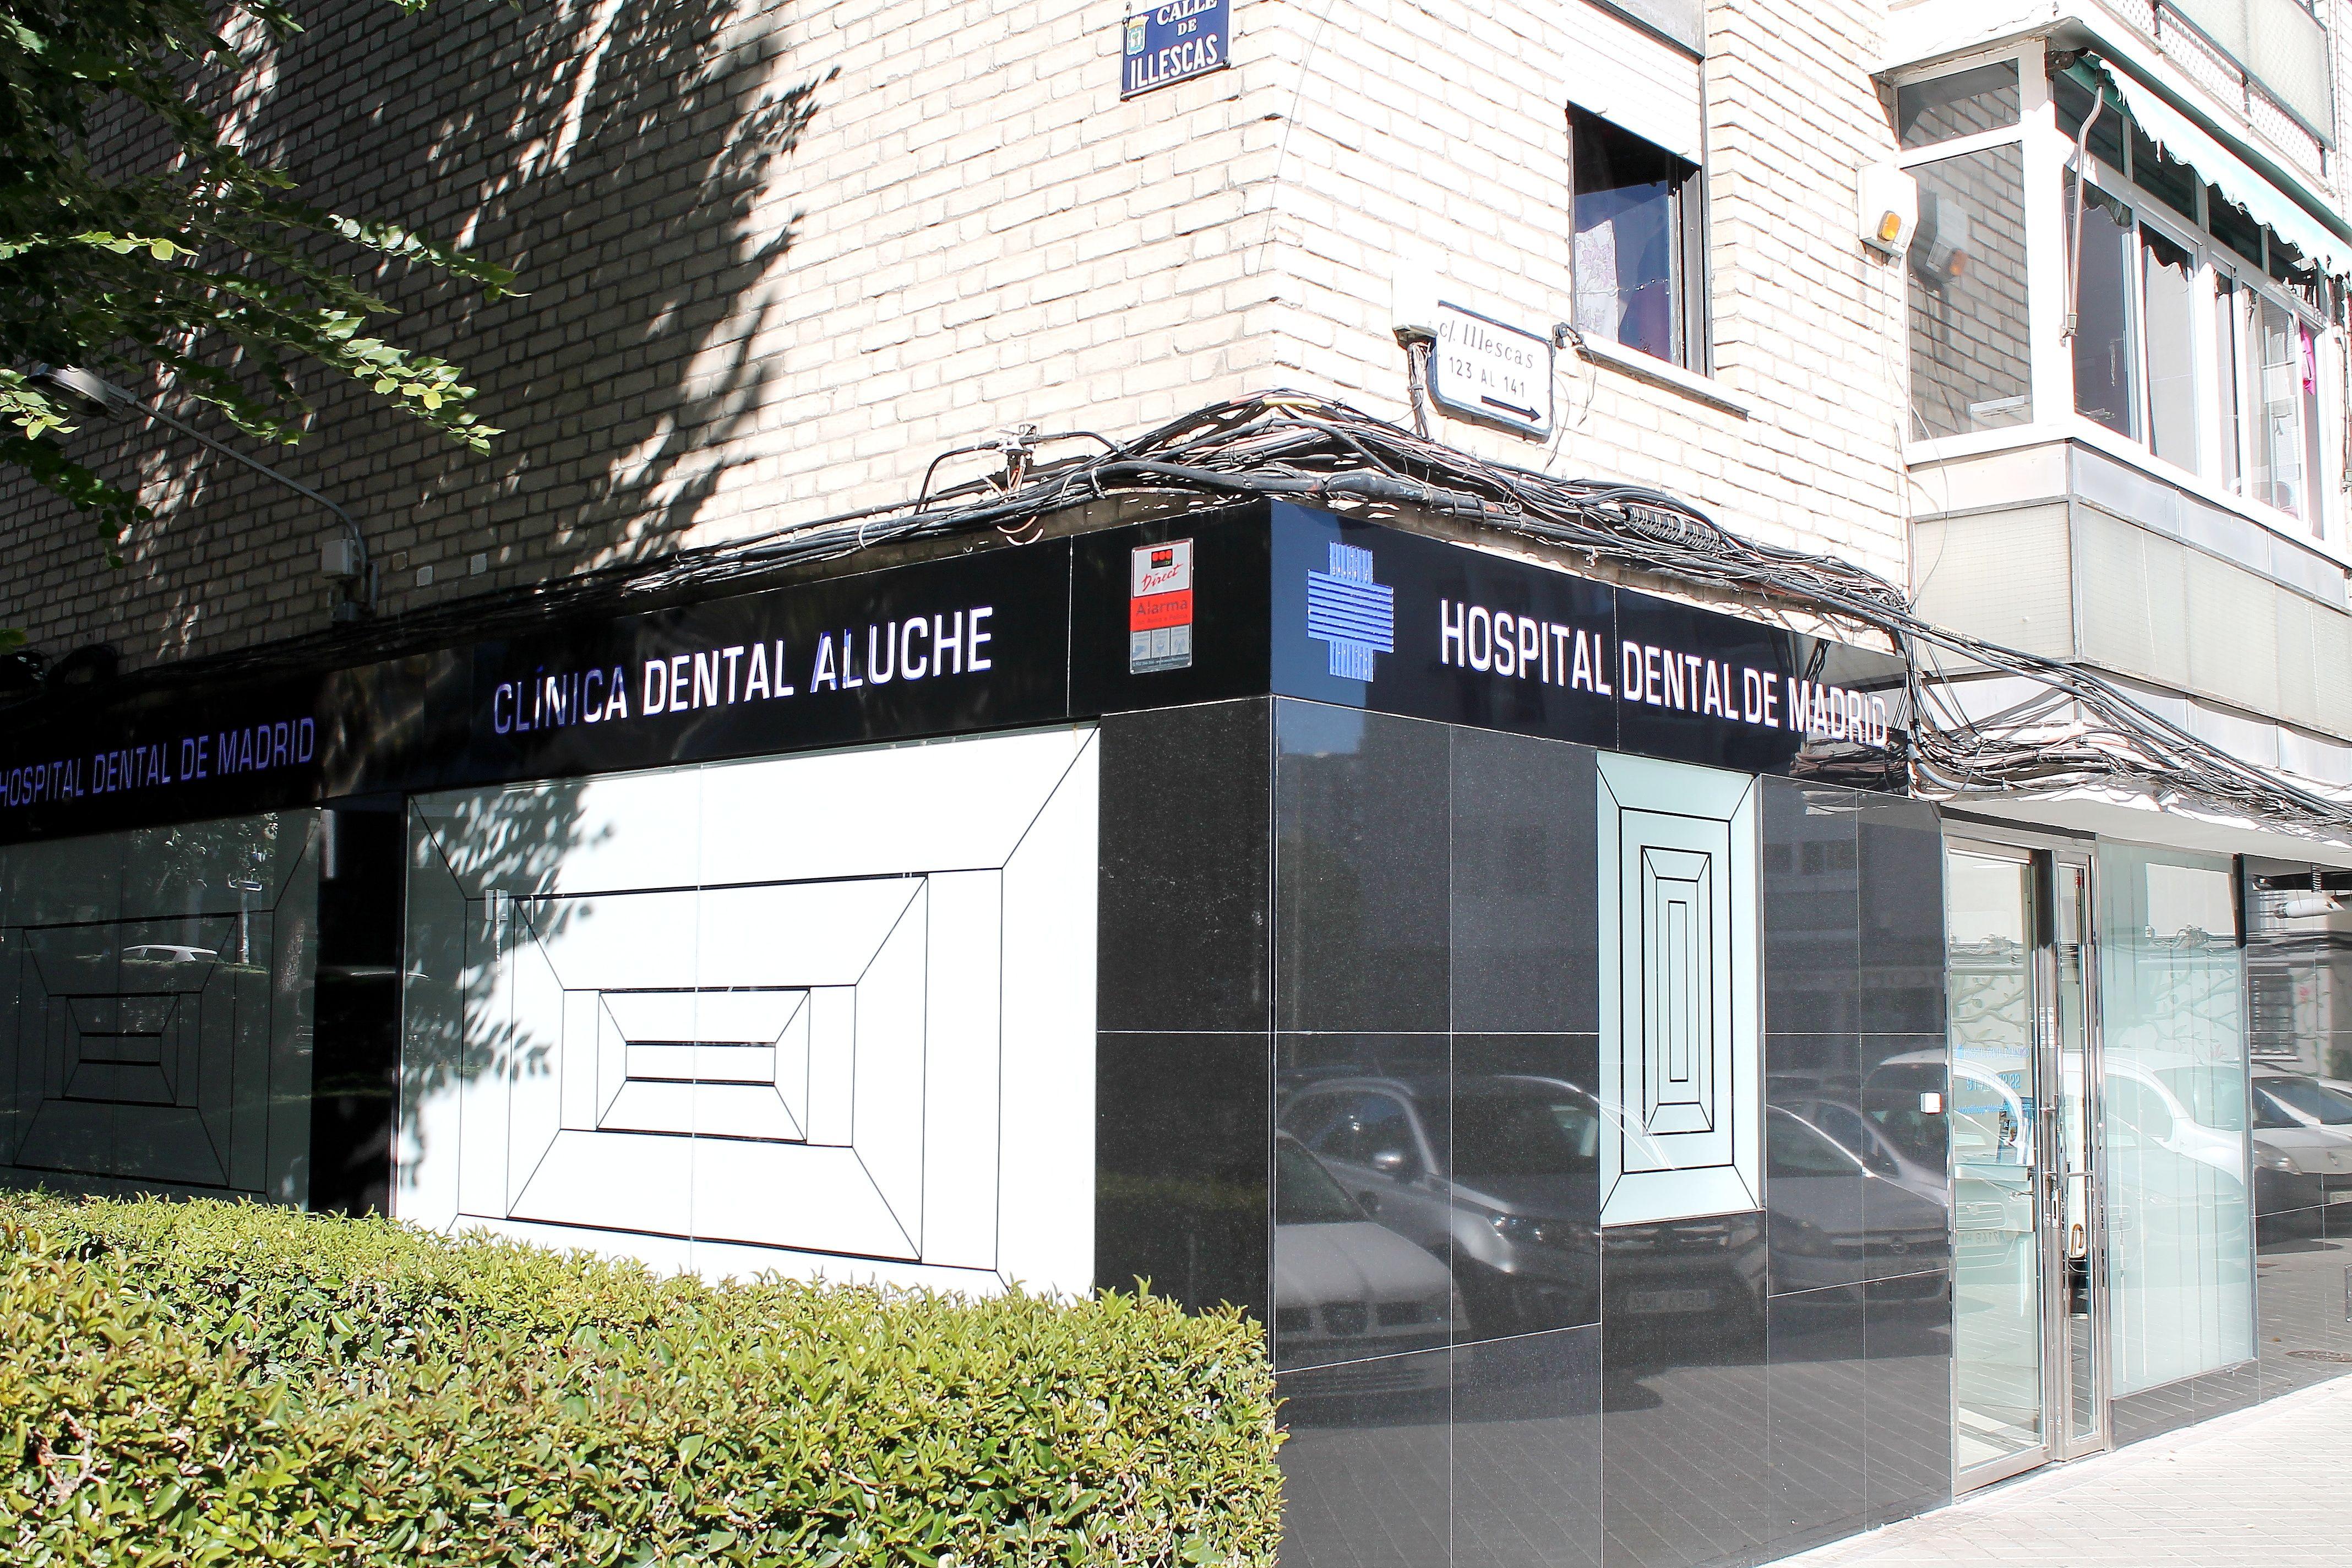 Hospital Dental Aluche en Madrid